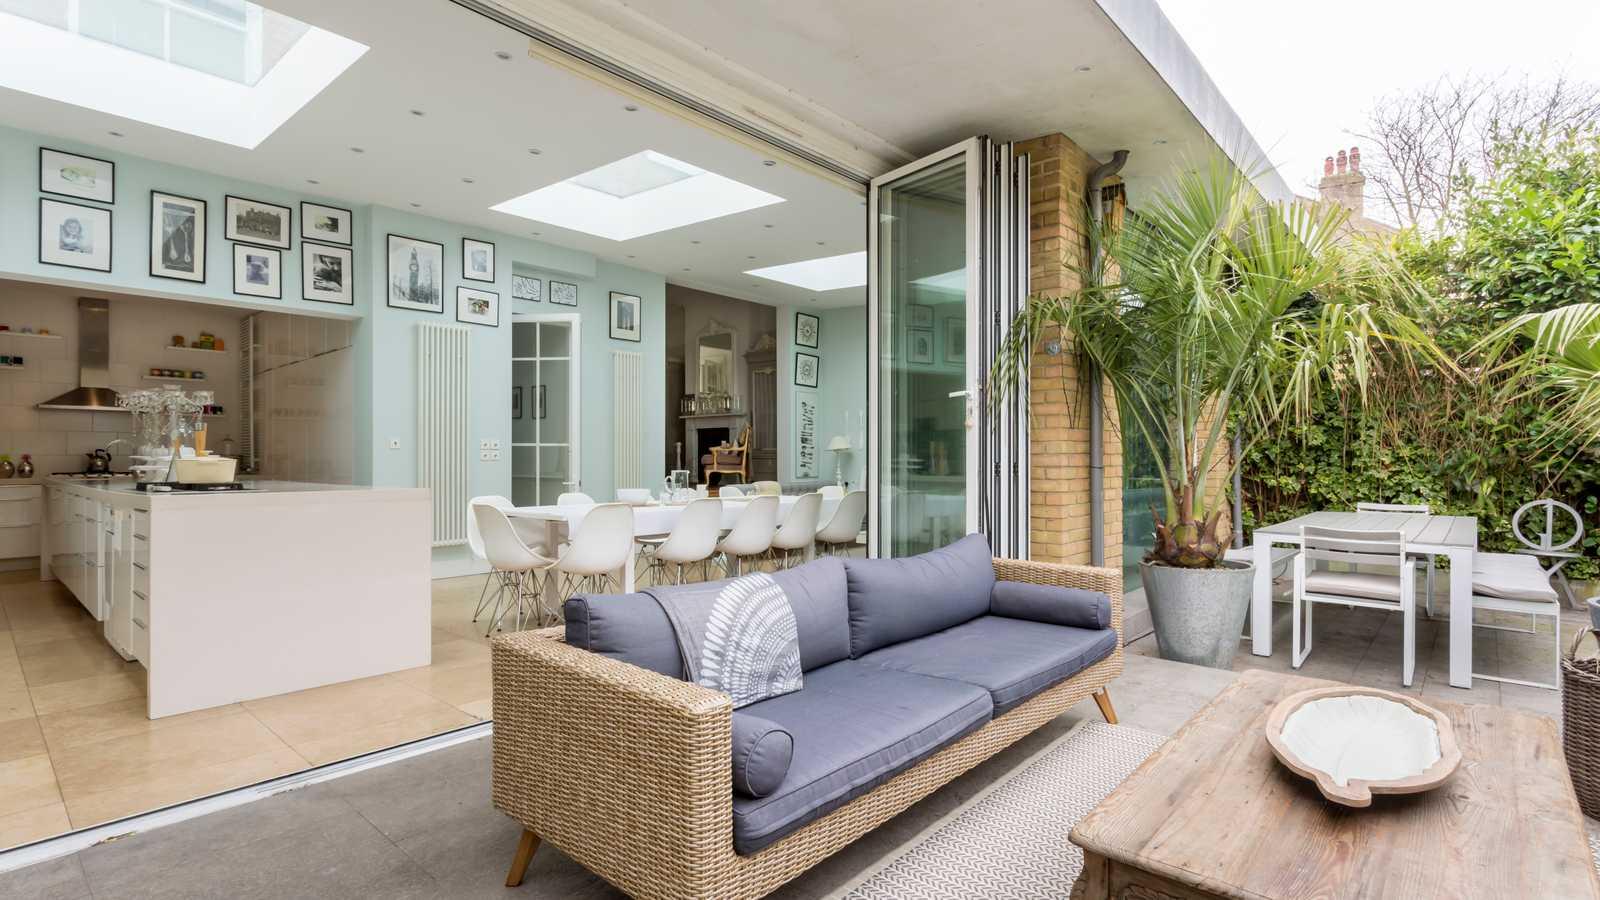 Kitchen Terrace Living room